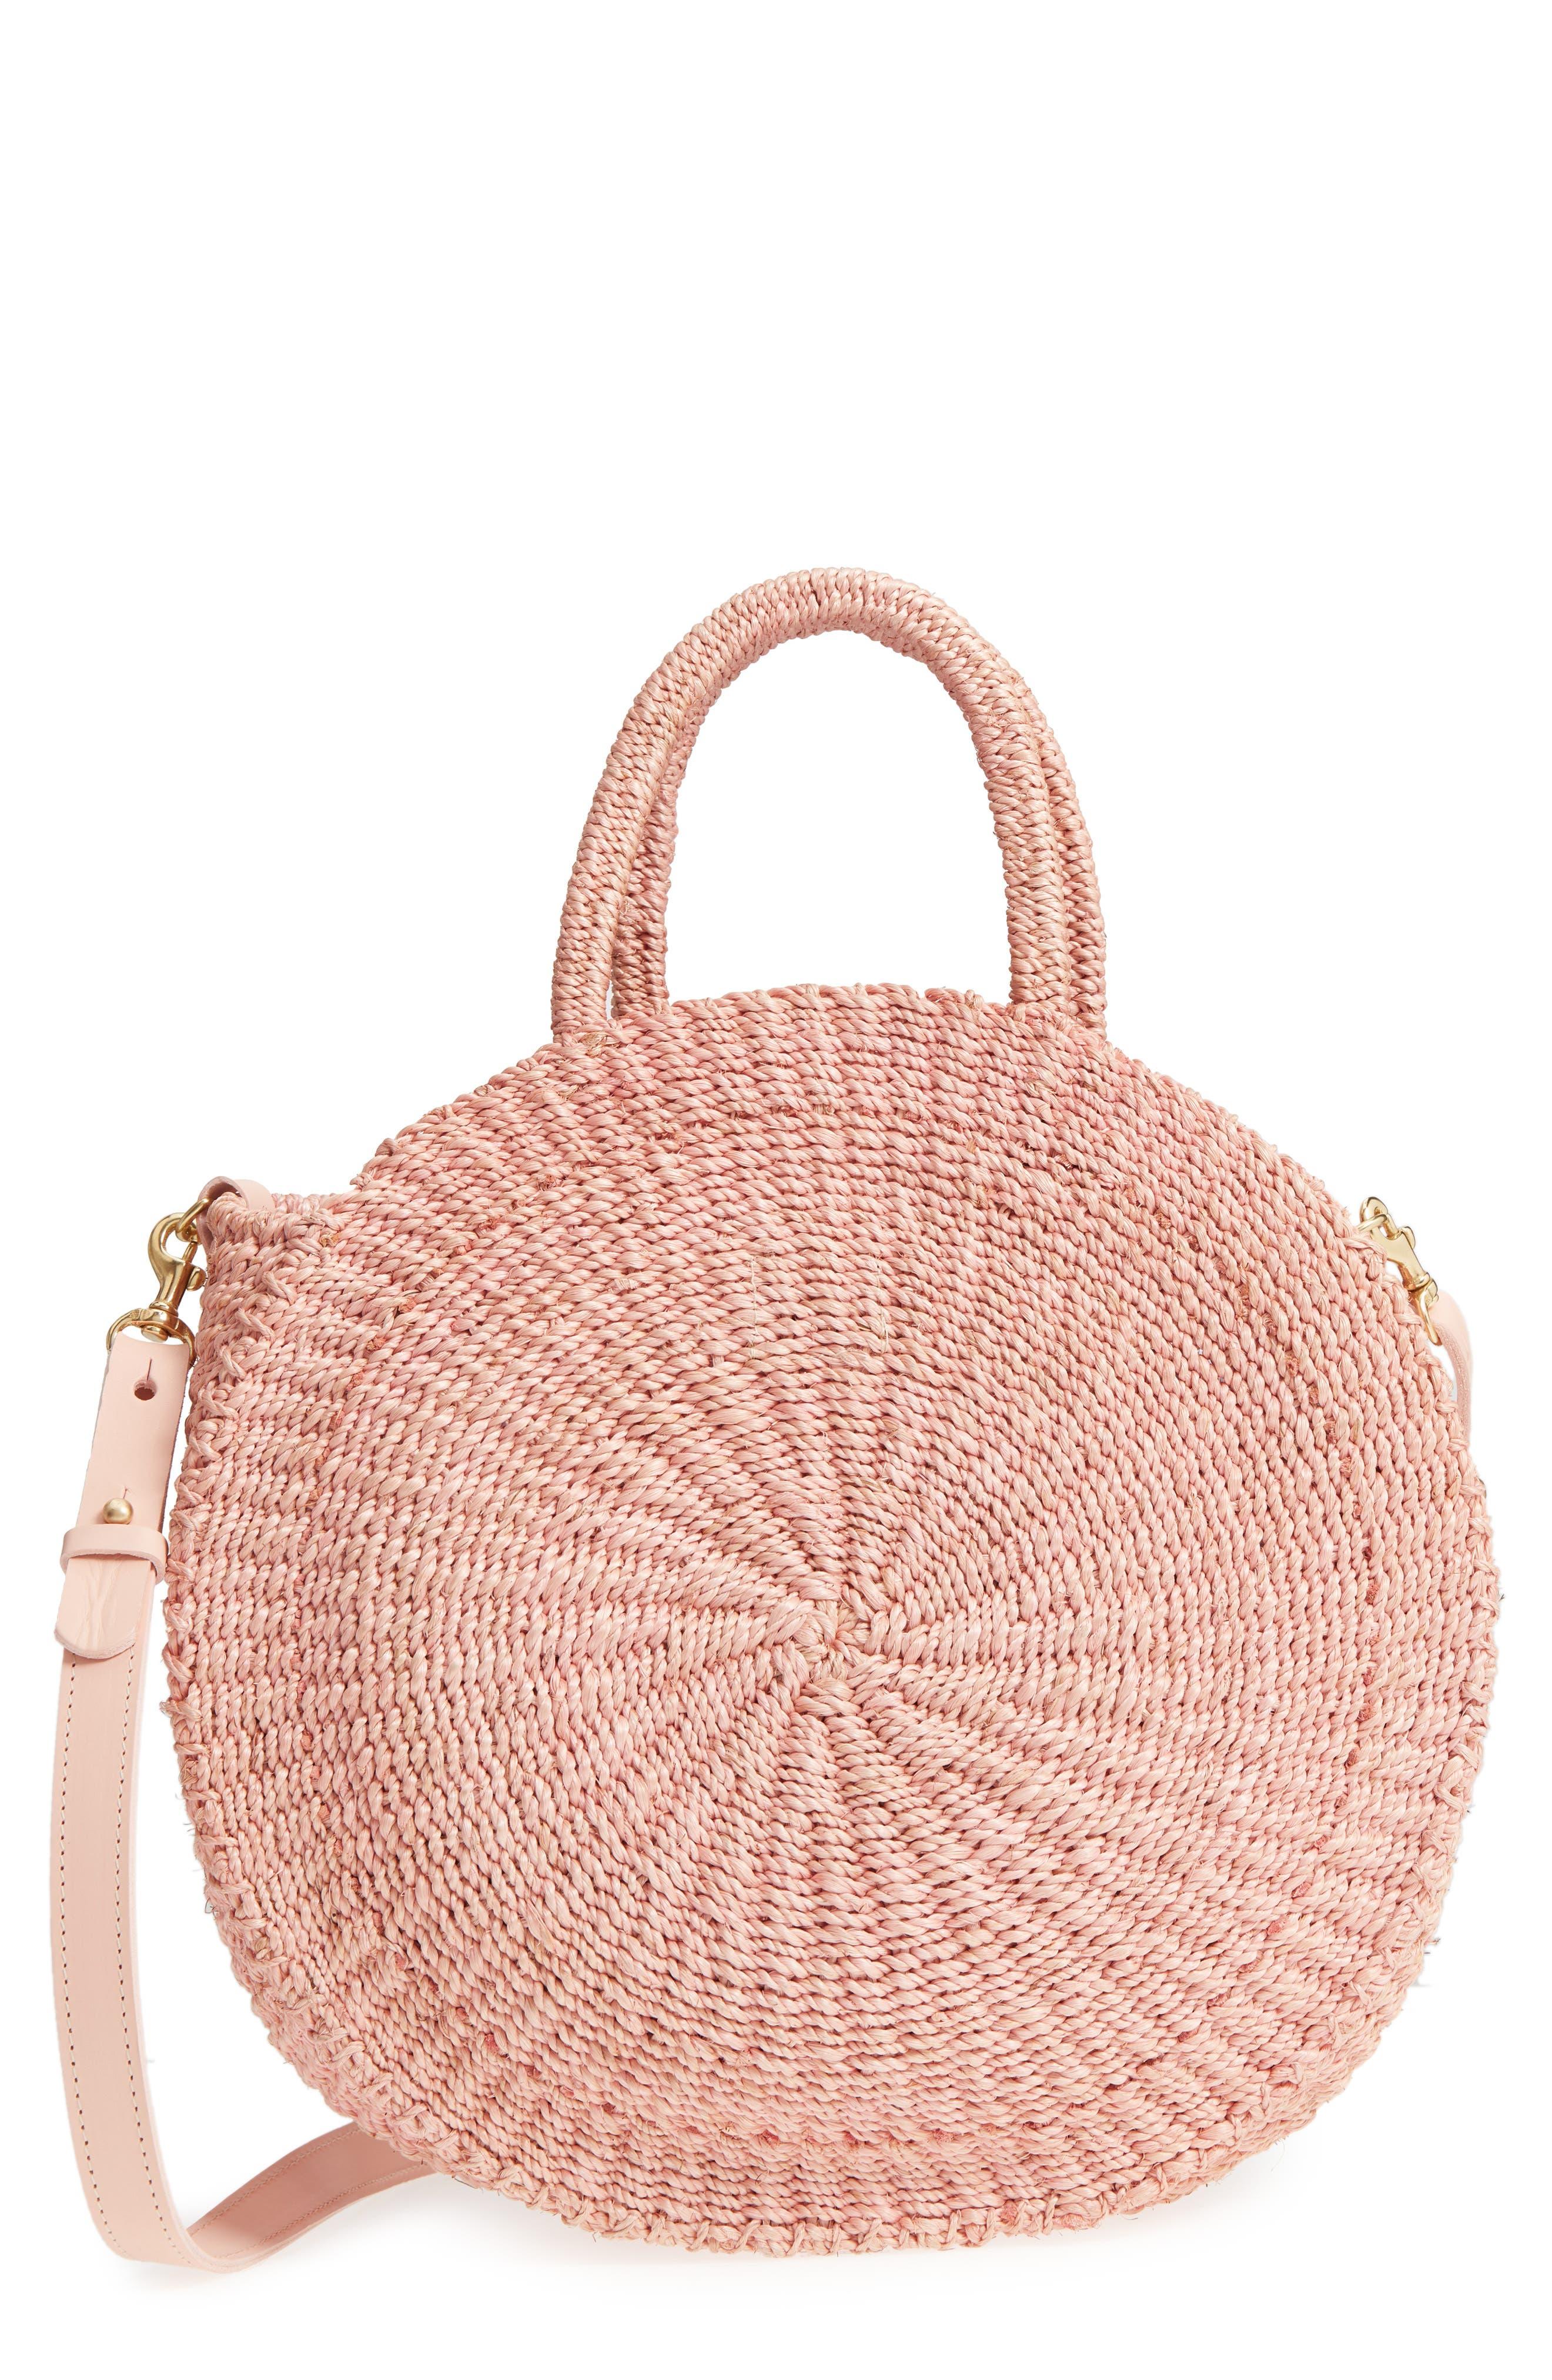 Alice Woven Sisal Straw Bag,                         Main,                         color, Blush Woven